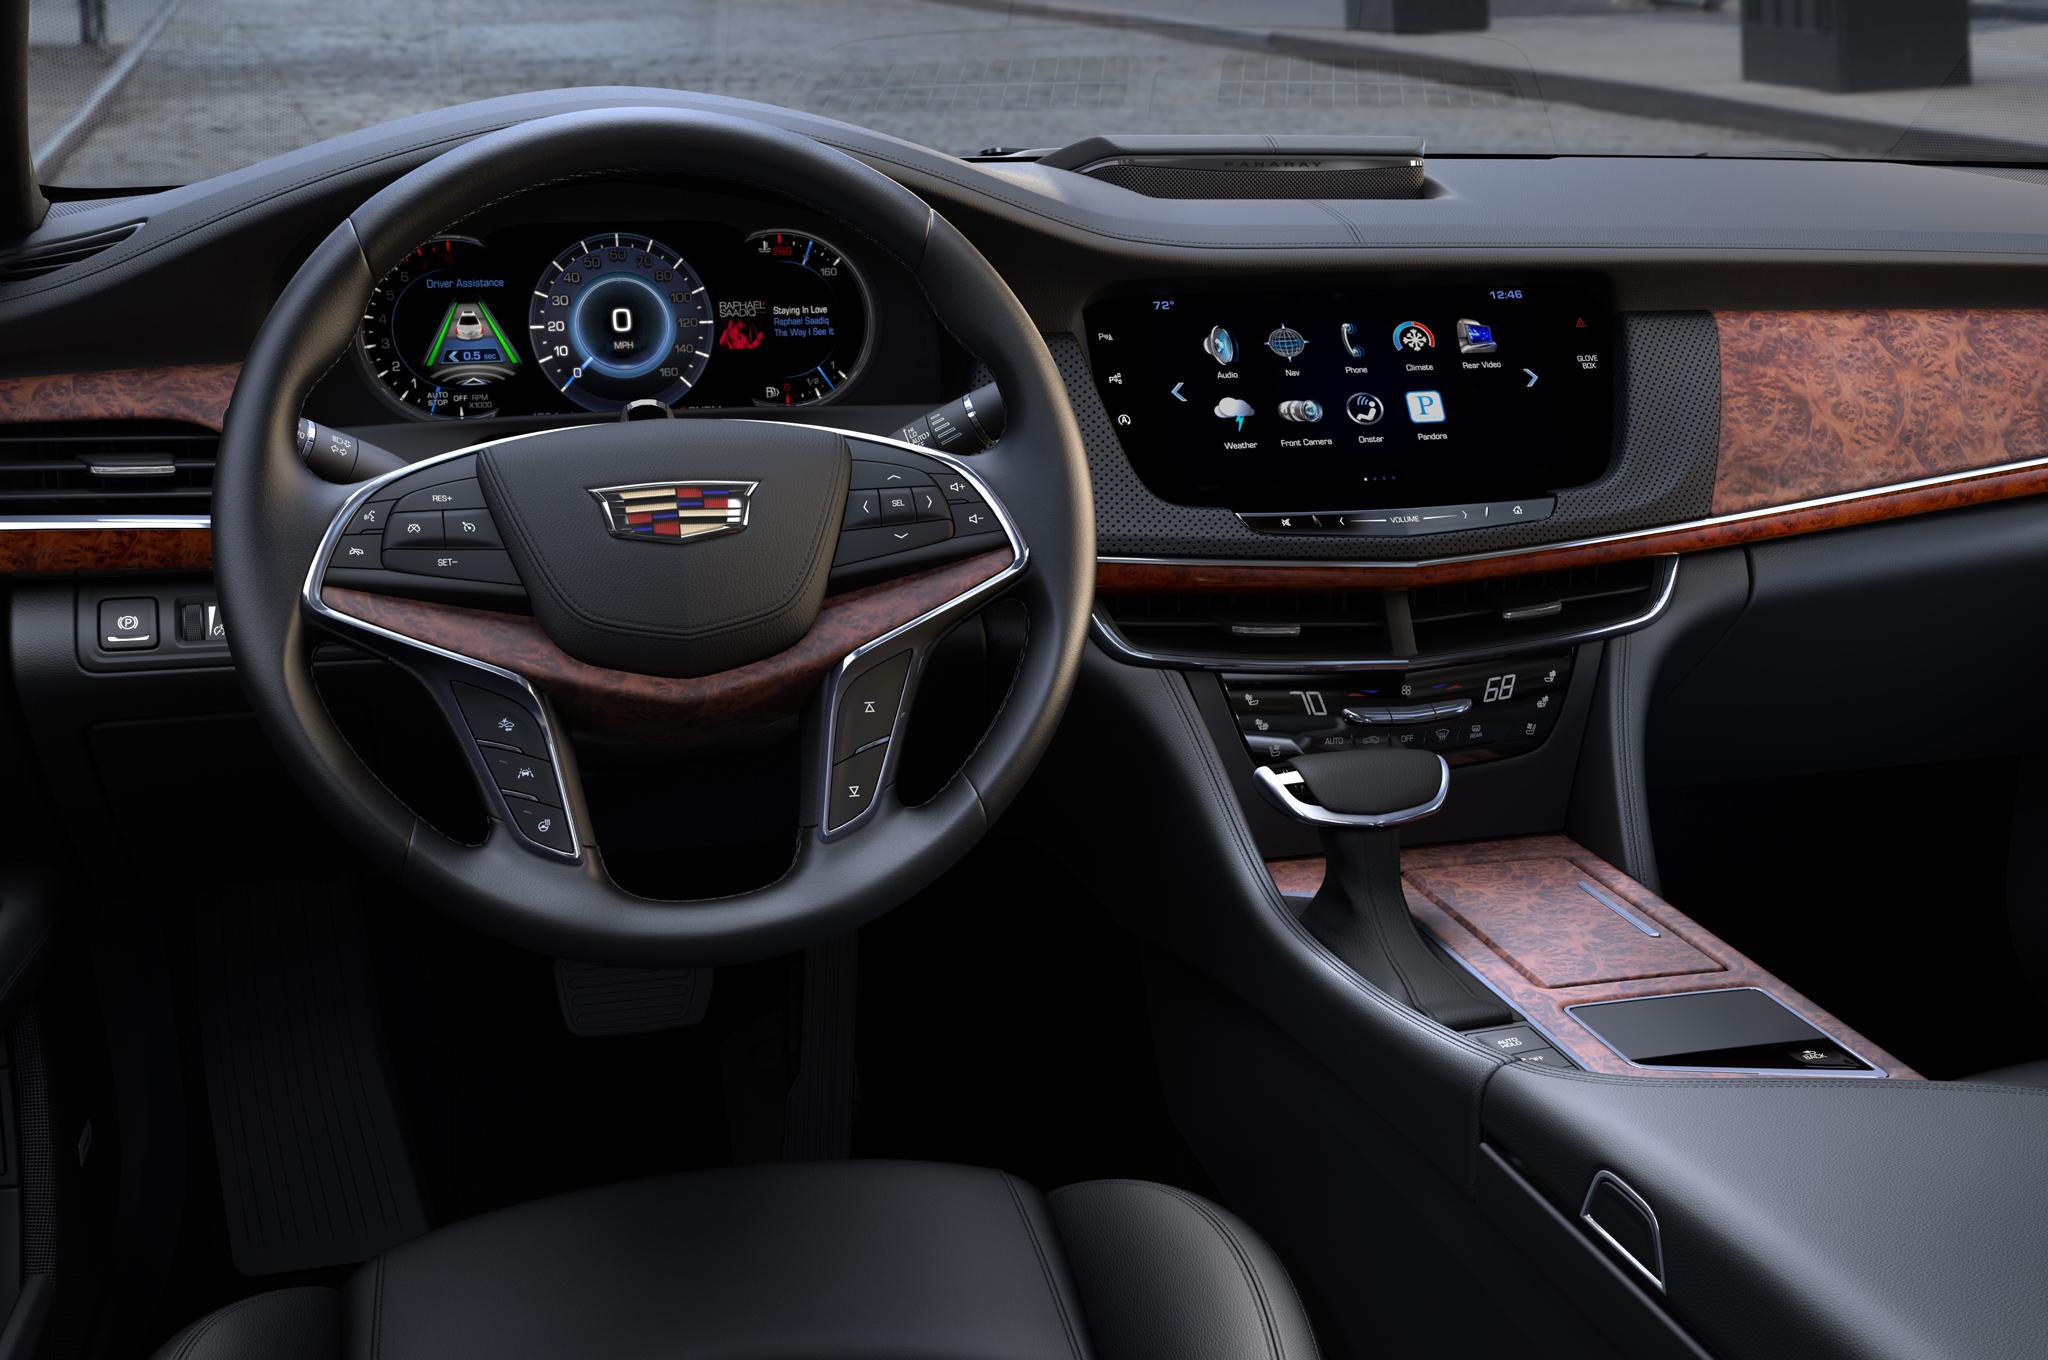 2016-Cadillac-CT6-interior1